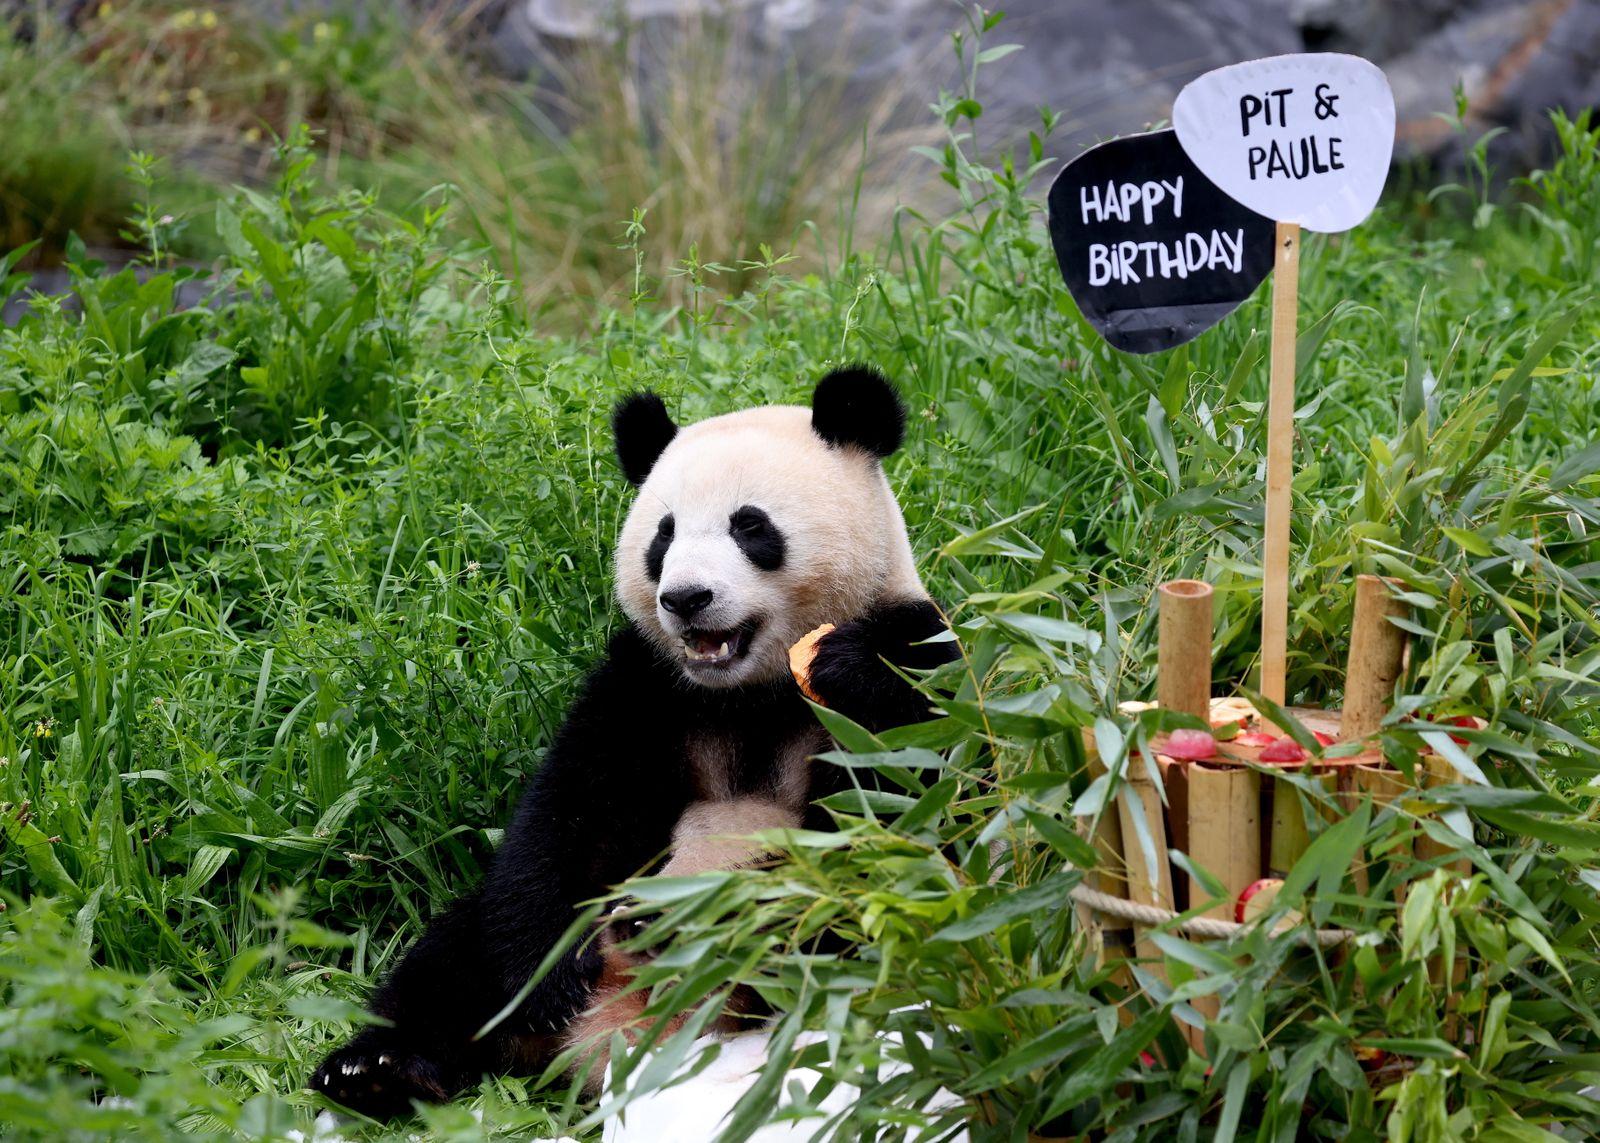 Baby pandas of Zoo Berlin celebrate their second birthday